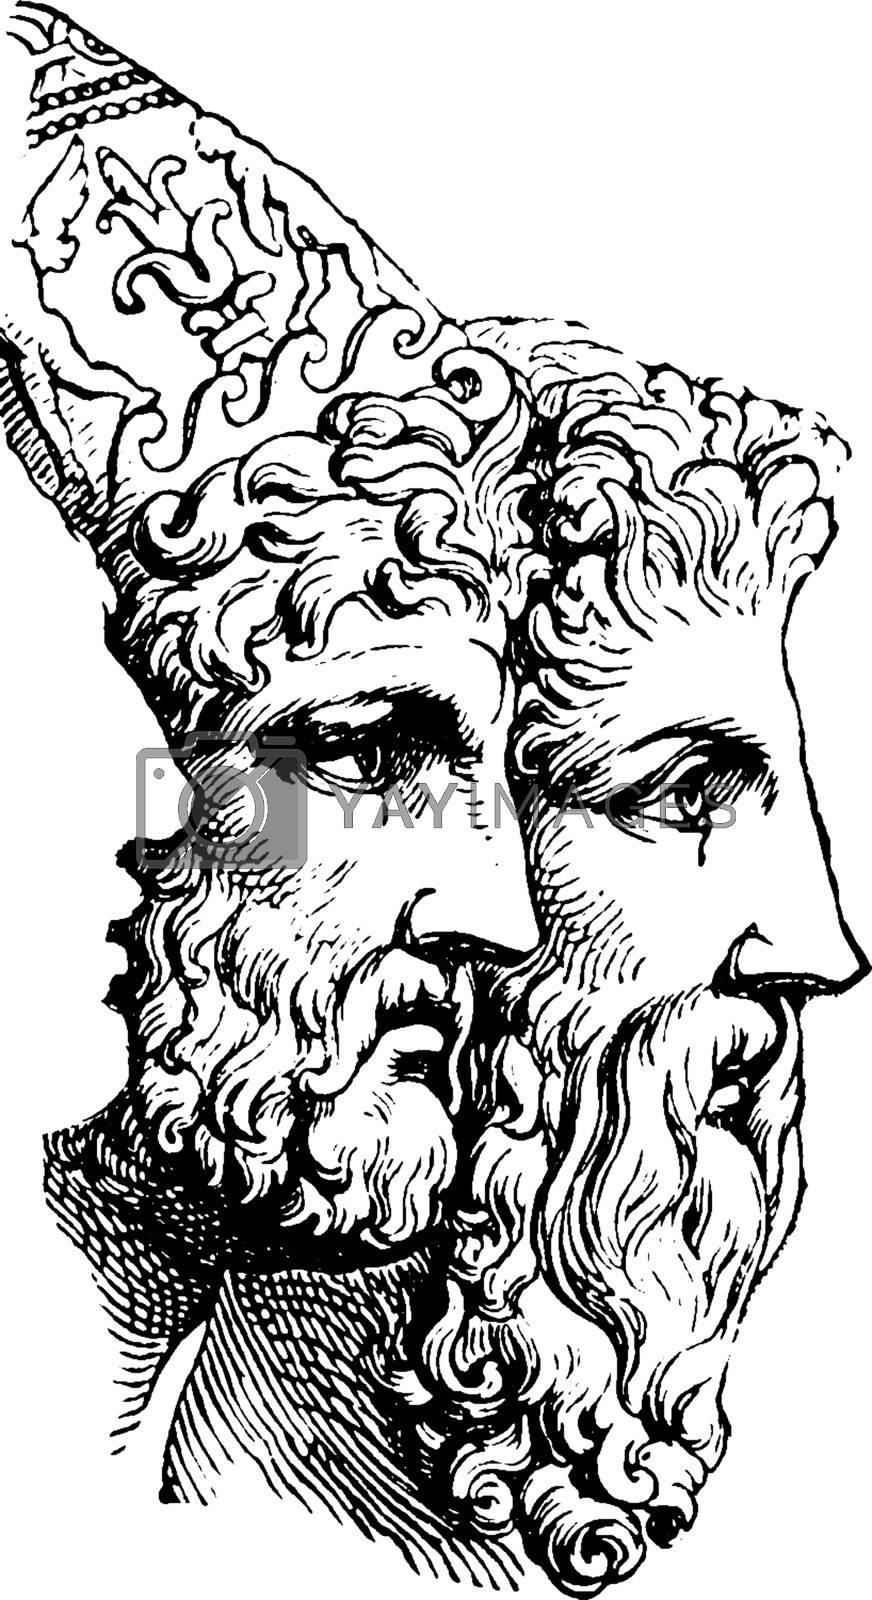 Agamemnon, vintage illustration by Morphart